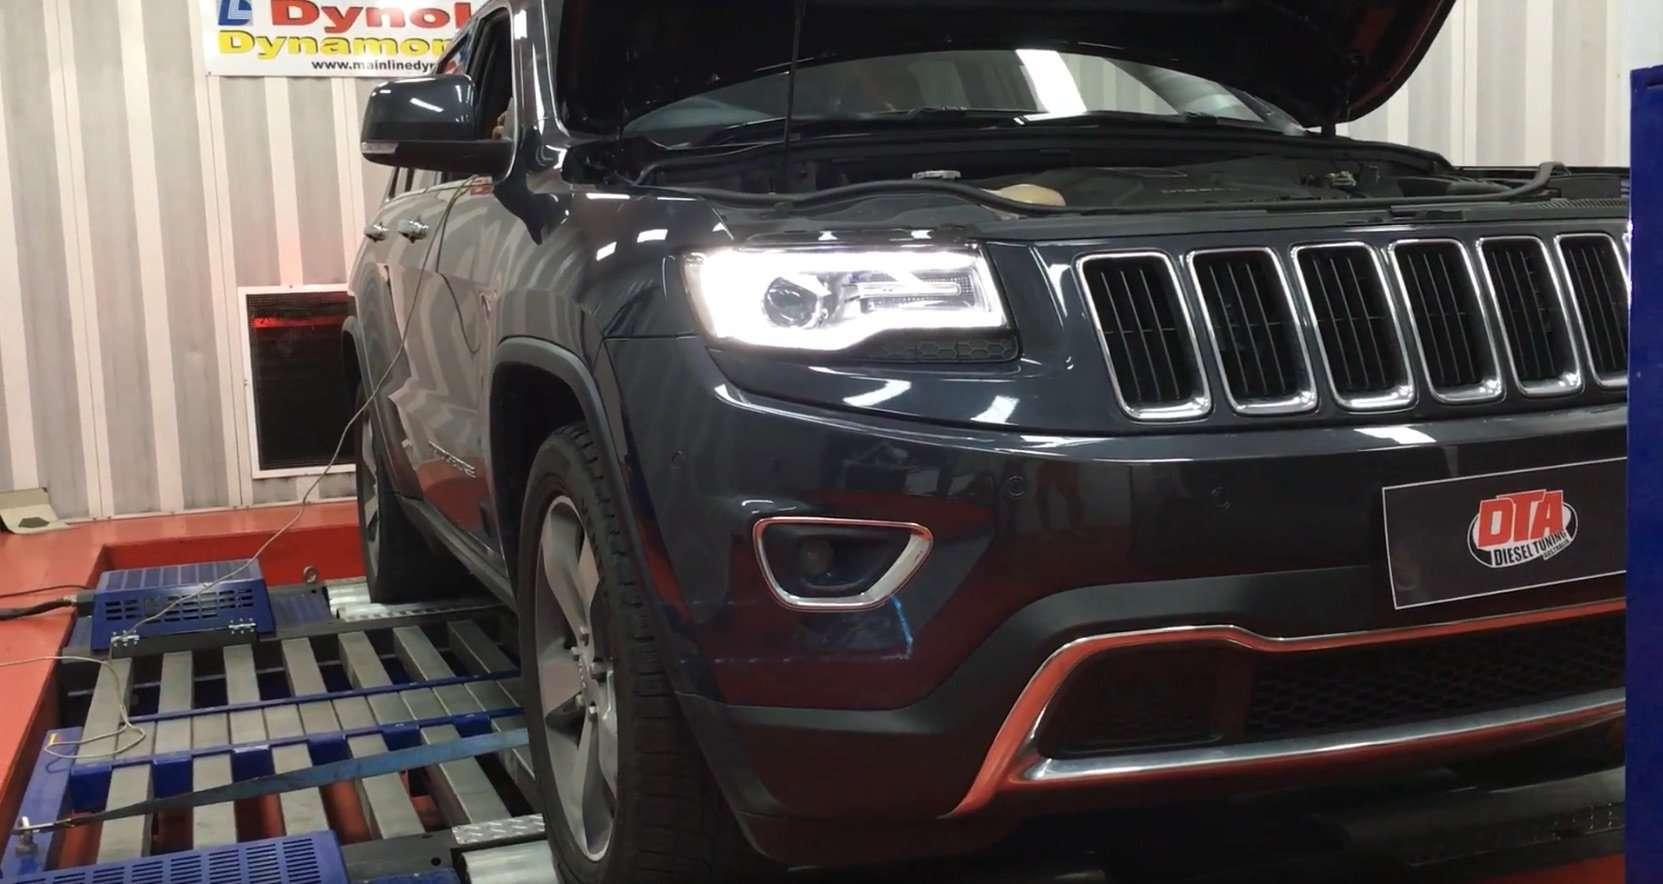 jeep grand cherokee ecu remap diesel tuning australia. Black Bedroom Furniture Sets. Home Design Ideas